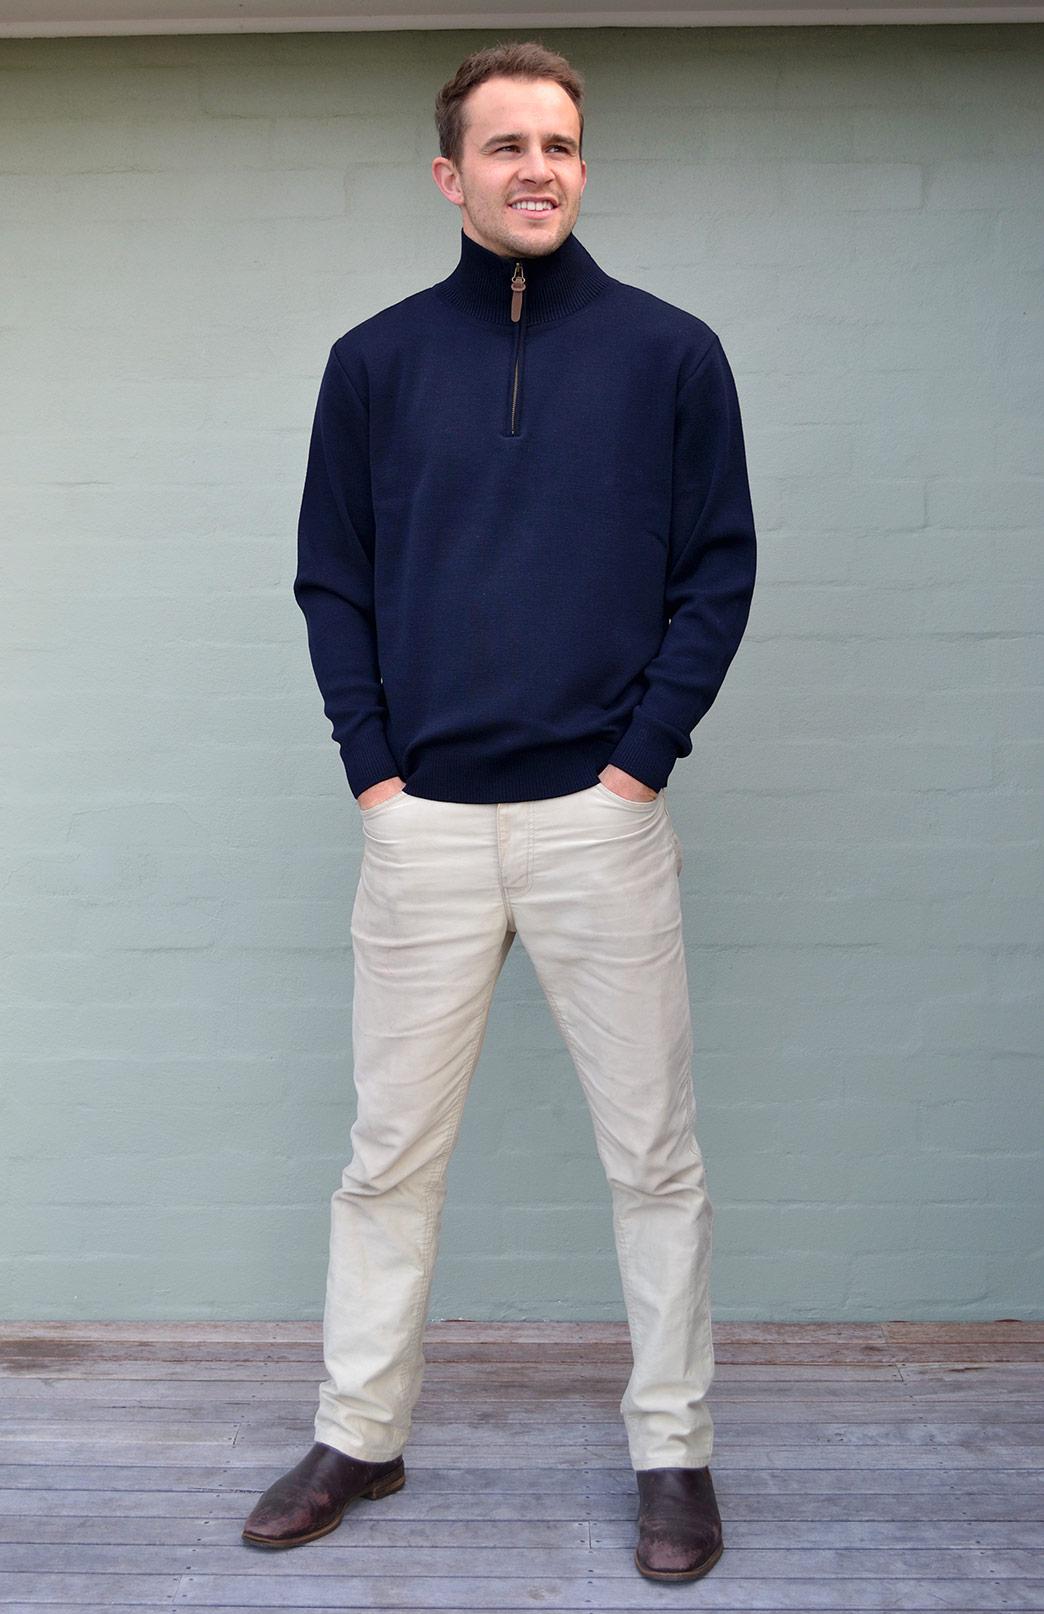 Men's Knitted Wool Zip Neck Jumper - Men's Navy Blue Knitted Superfine Merino Wool Classic Style Zip Neck Jumper - Smitten Merino Tasmania Australia